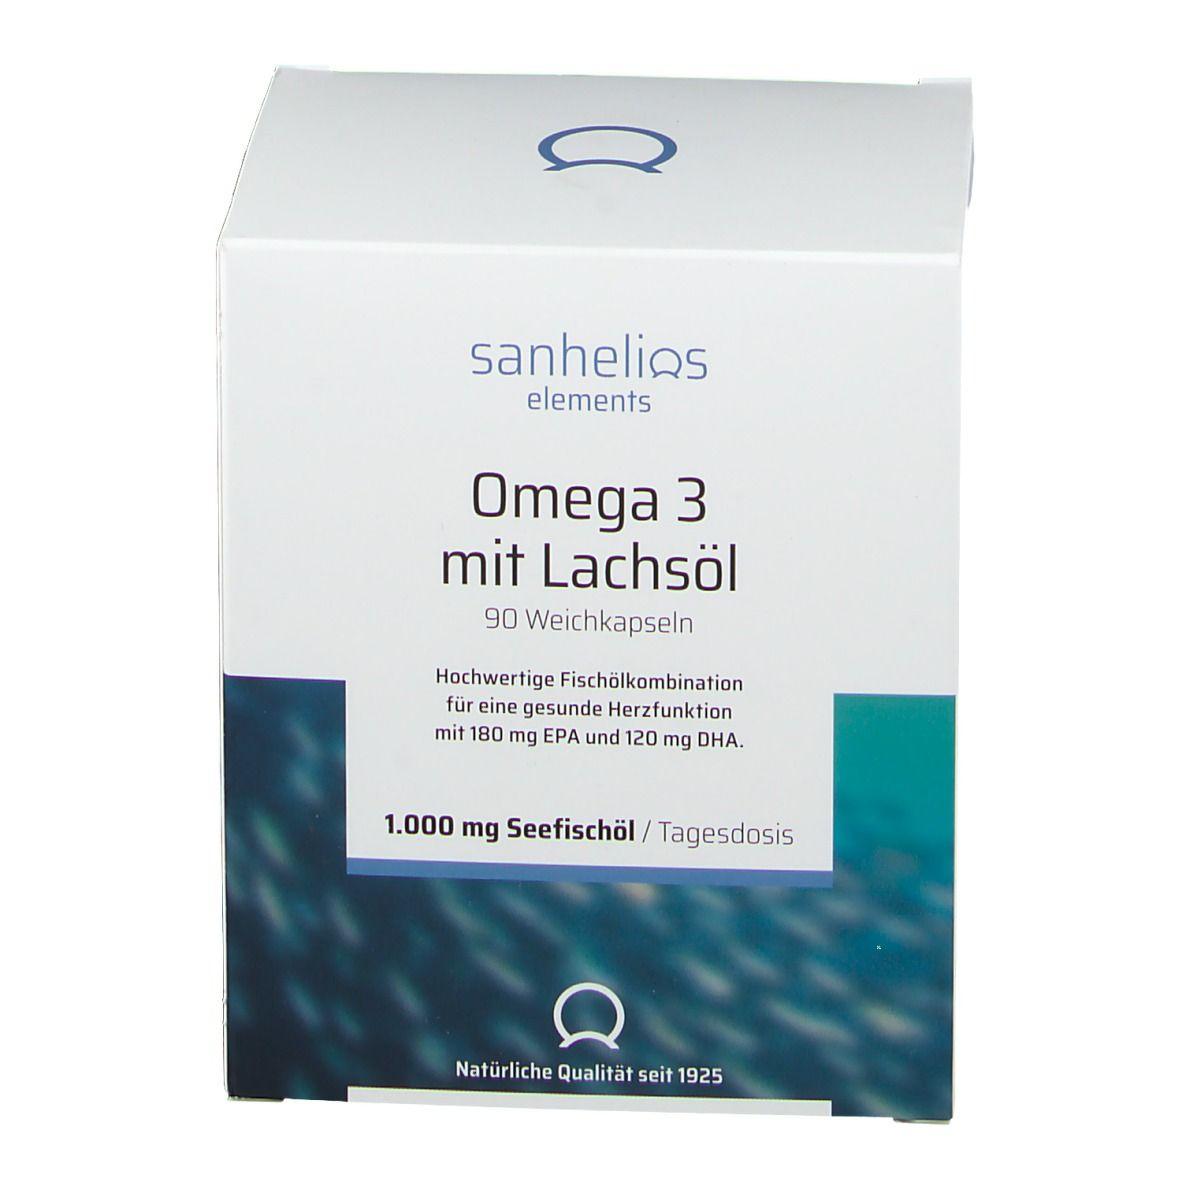 Sanhelios Omega 3 mit Lachsöl